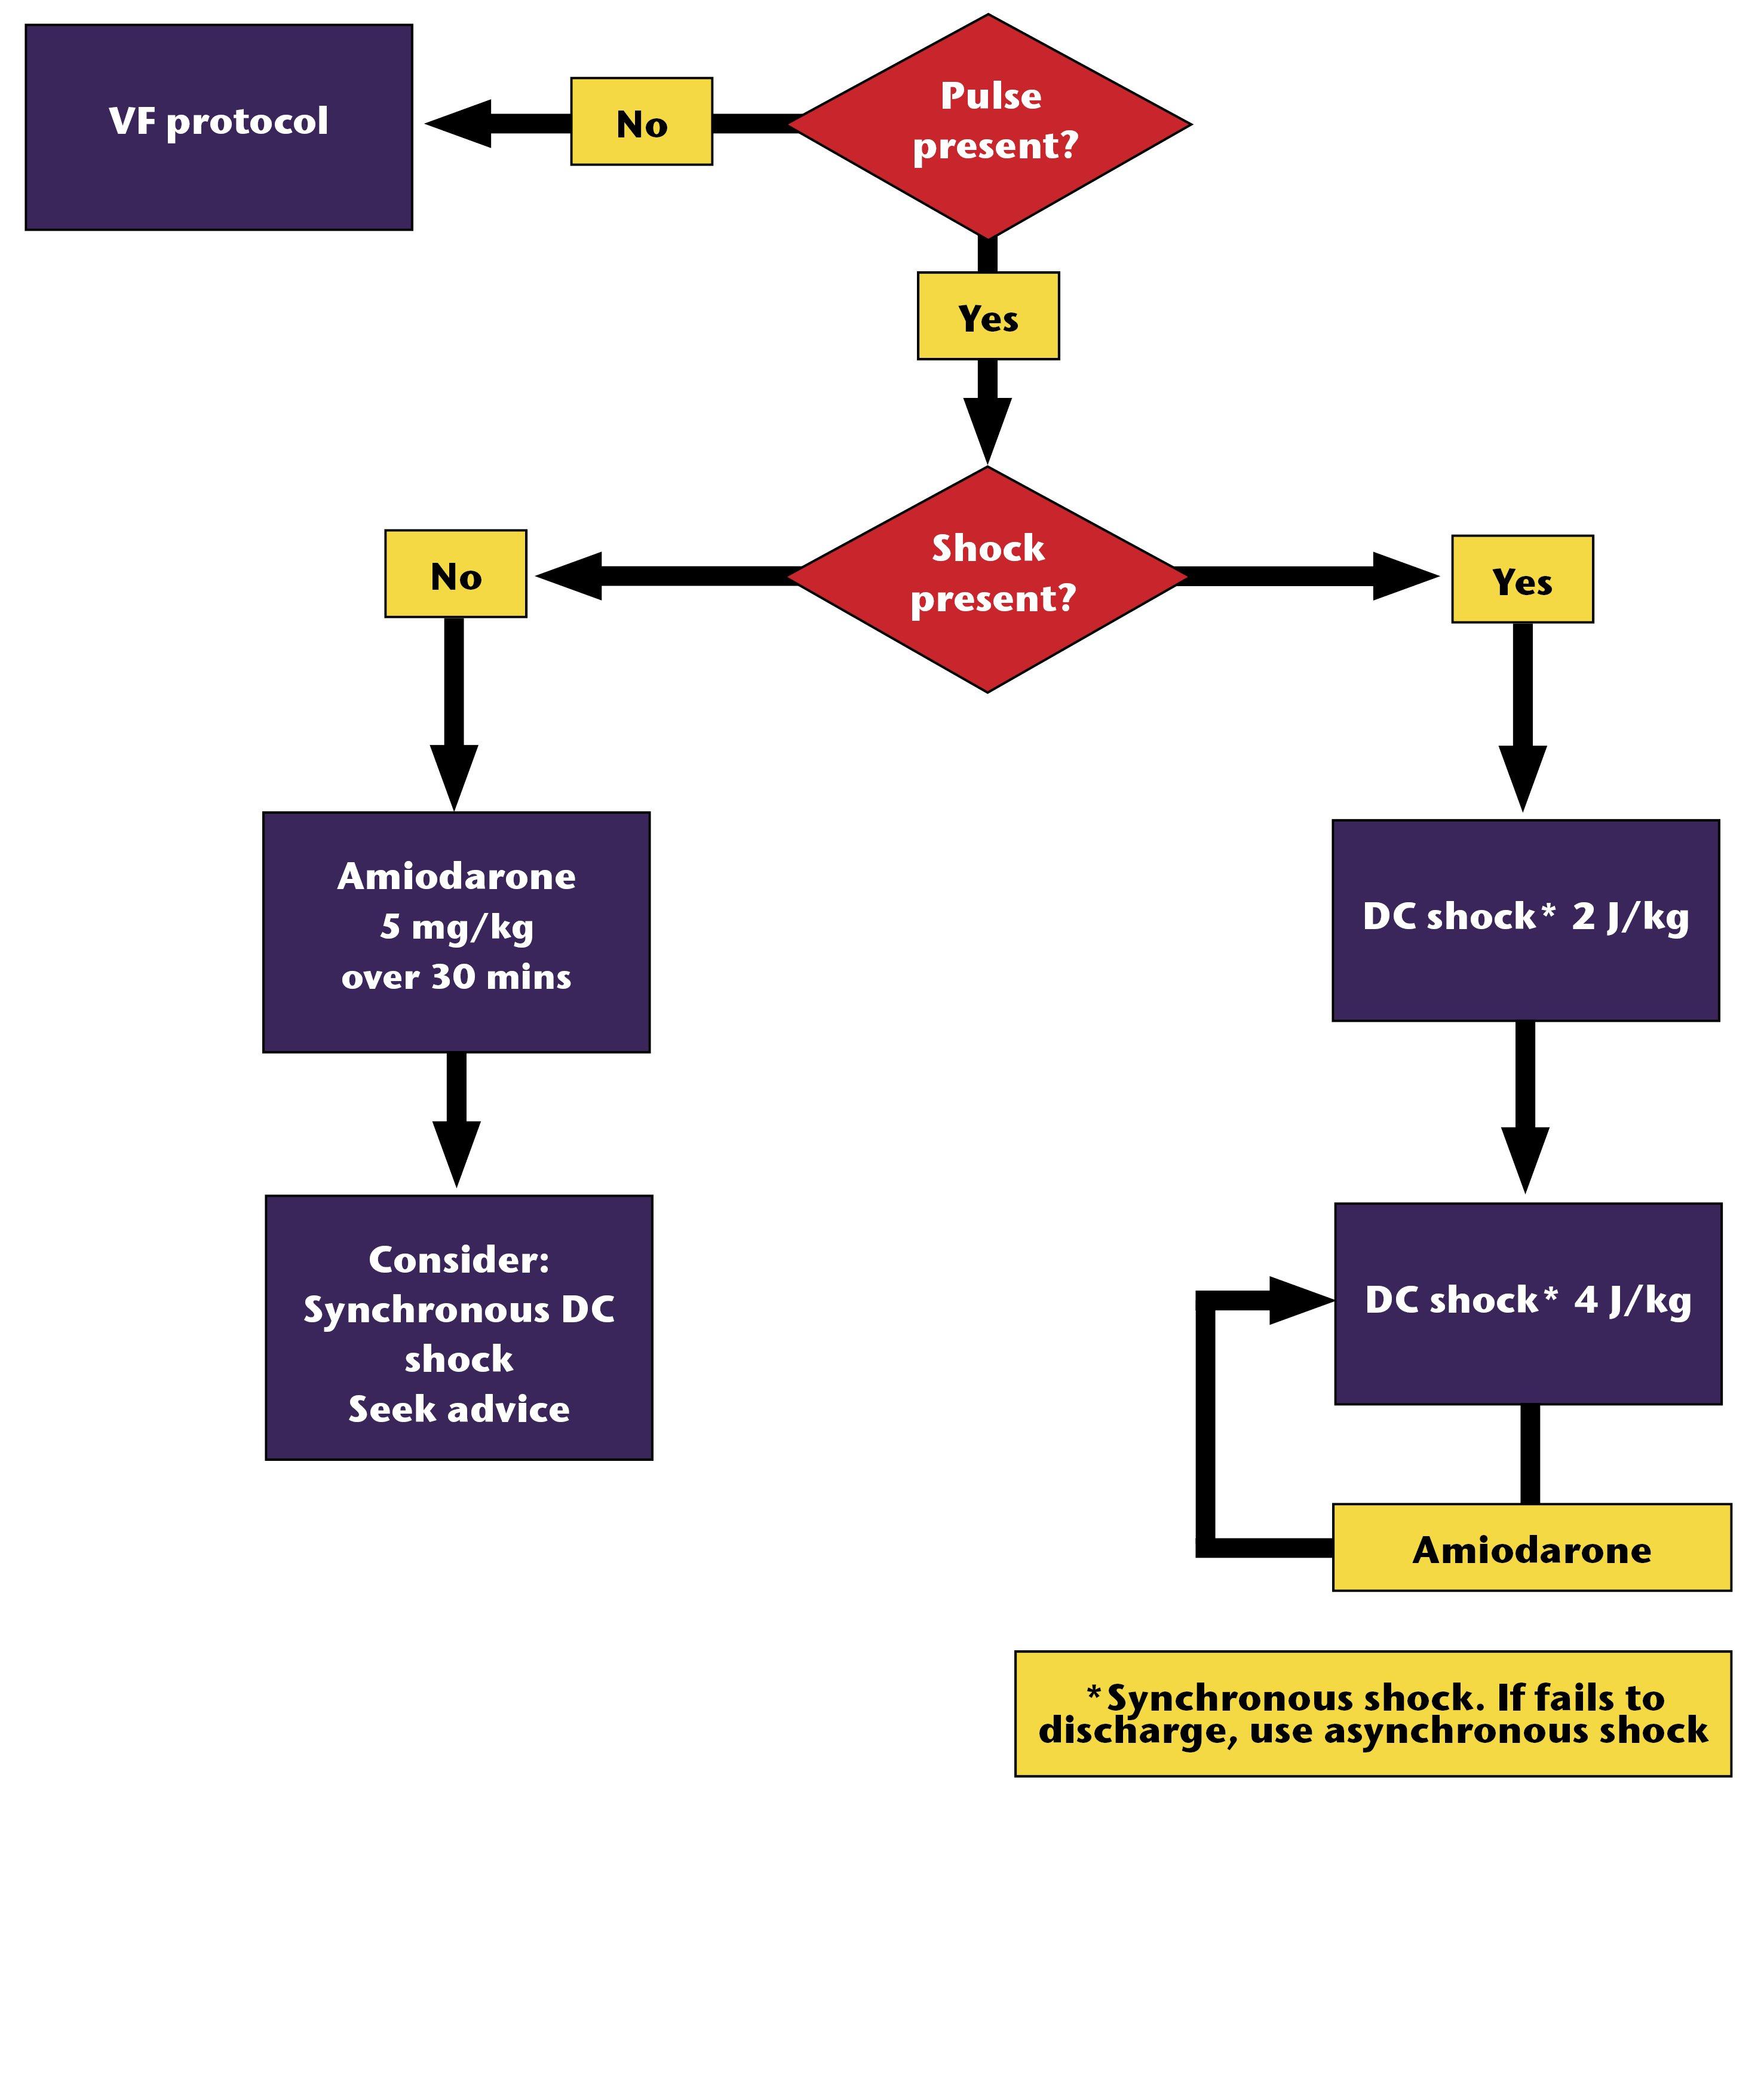 Figure 7.5 - Management of VT